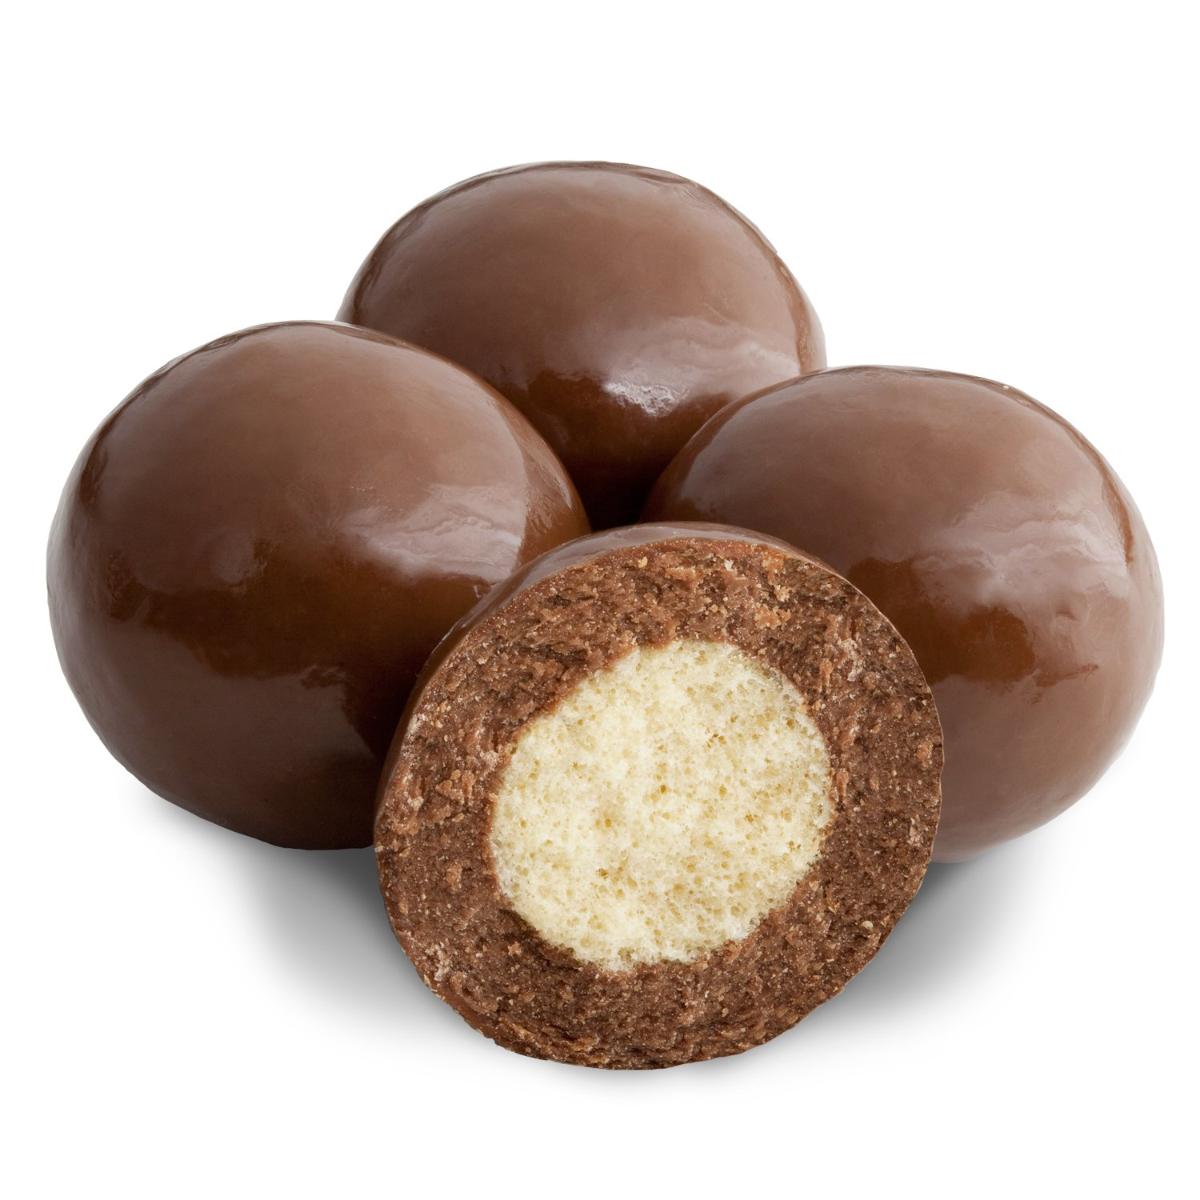 milk-chocolate-malted-milk-balls-12lb